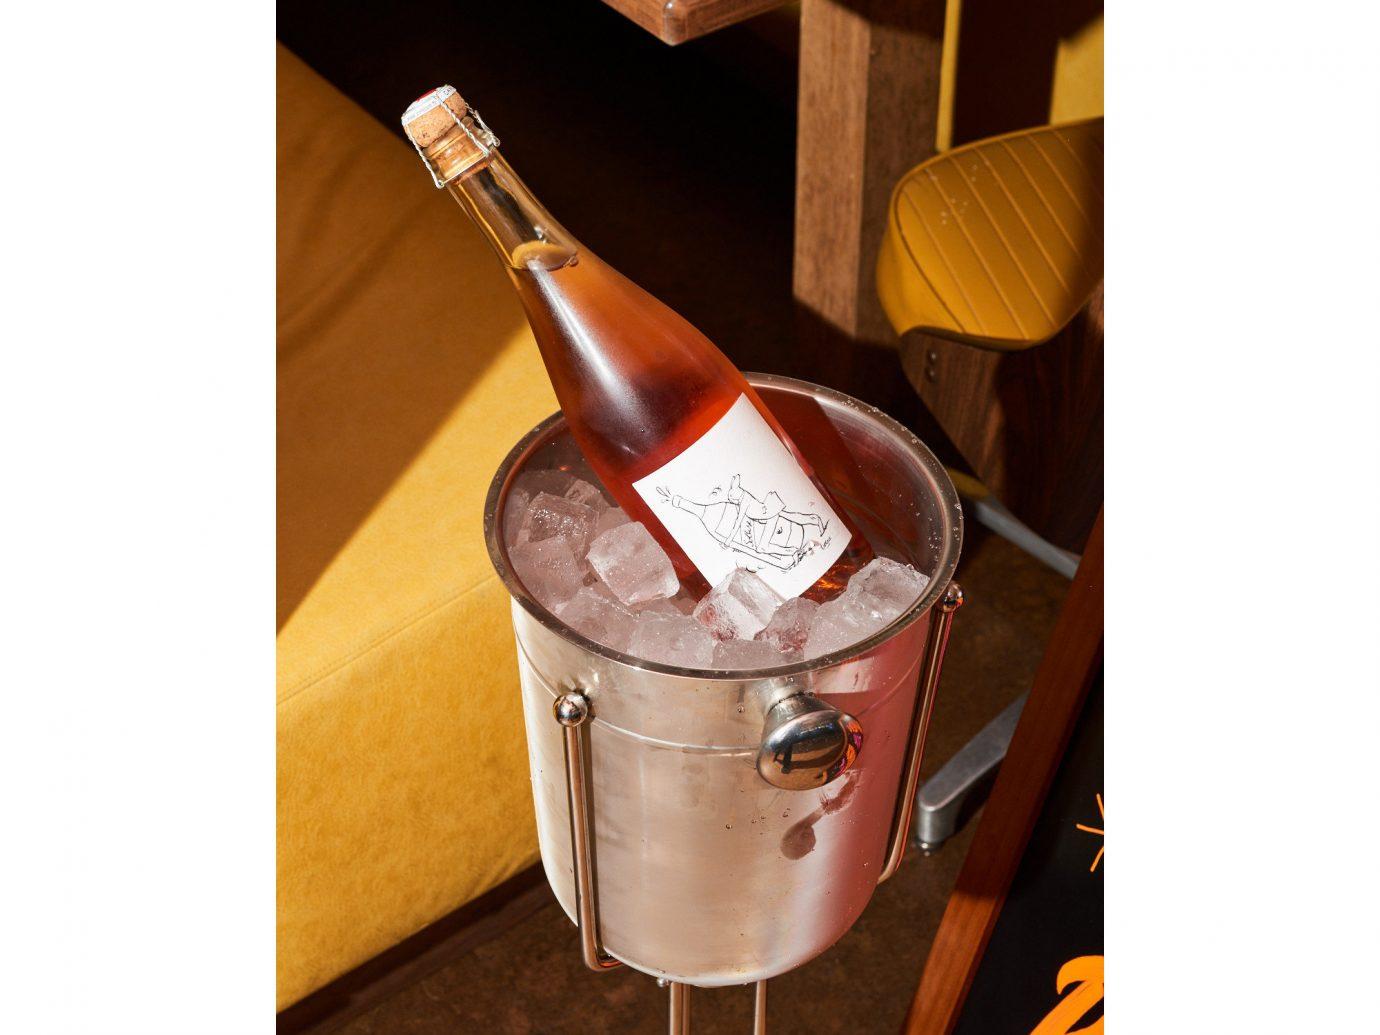 Food + Drink Trip Ideas indoor Drink wine champagne drinkware tableware bottle wine bottle